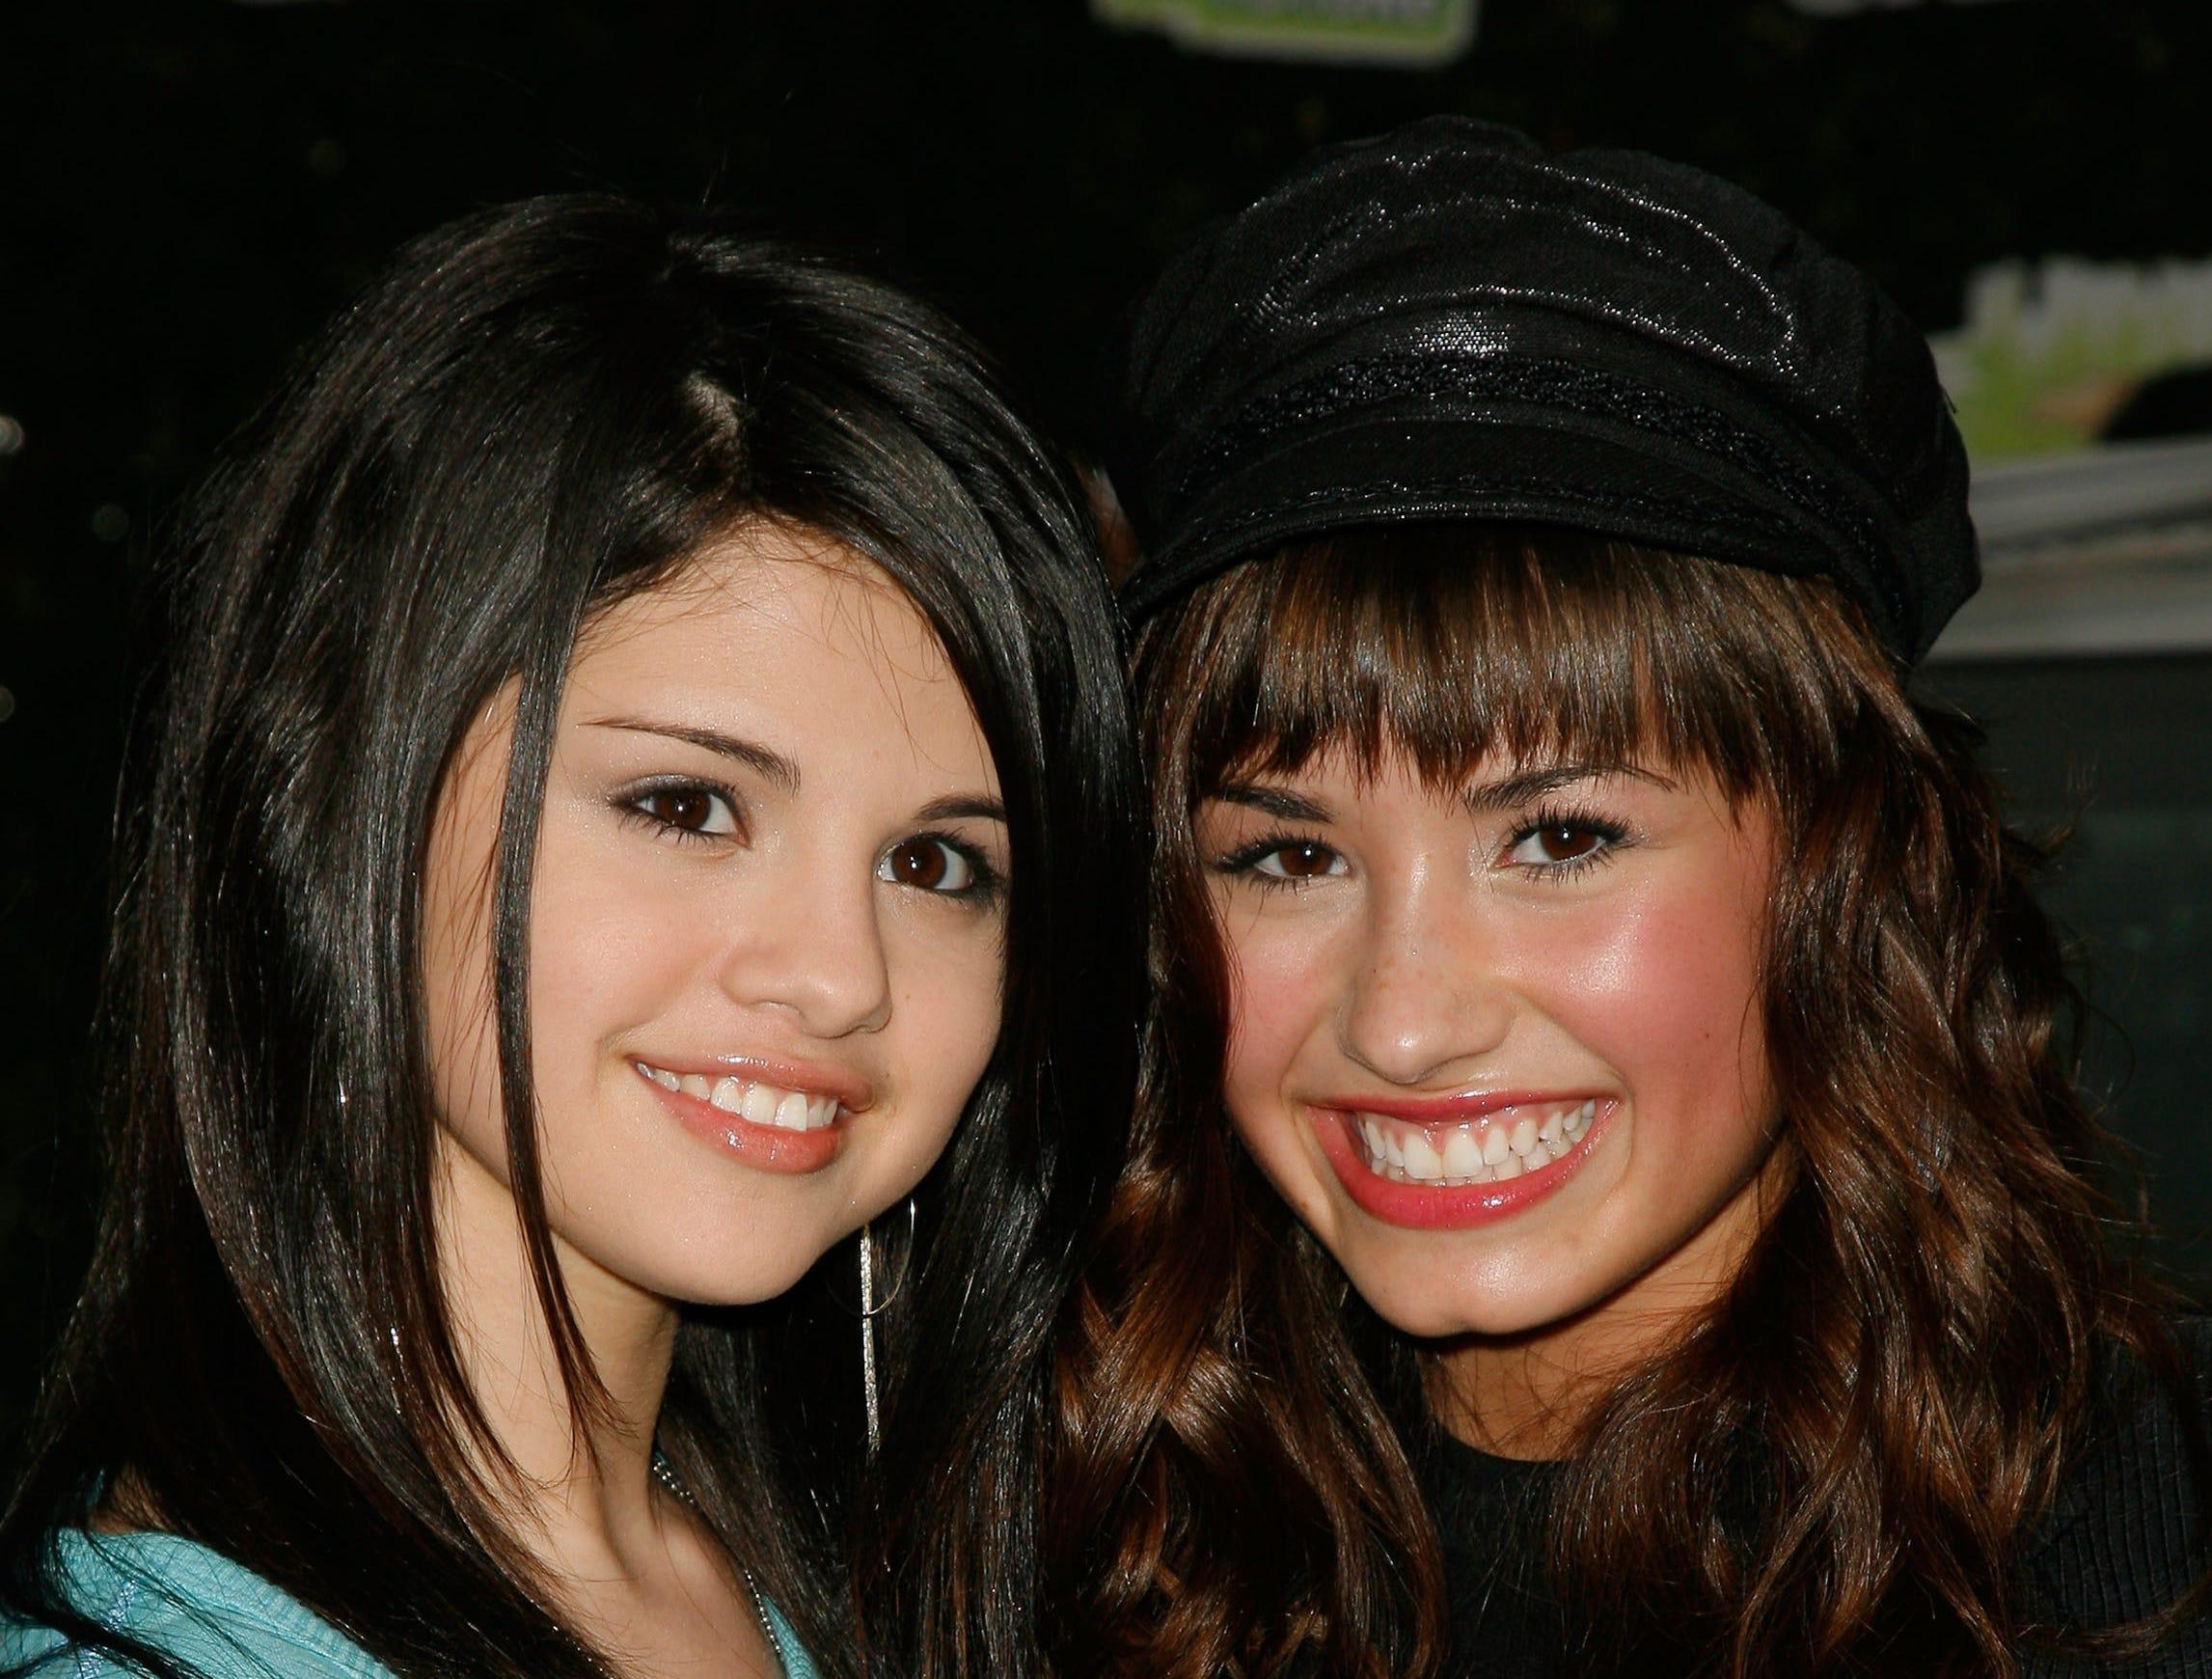 BURBANK, CA - FEBRUARY 19:  Actresses Selena Gomez and Demi Lovato arrive at Chevy Rocks The Future at the Buena Vista Lot at The Walt Disney Studios February 19, 2008 in Burbank, California.